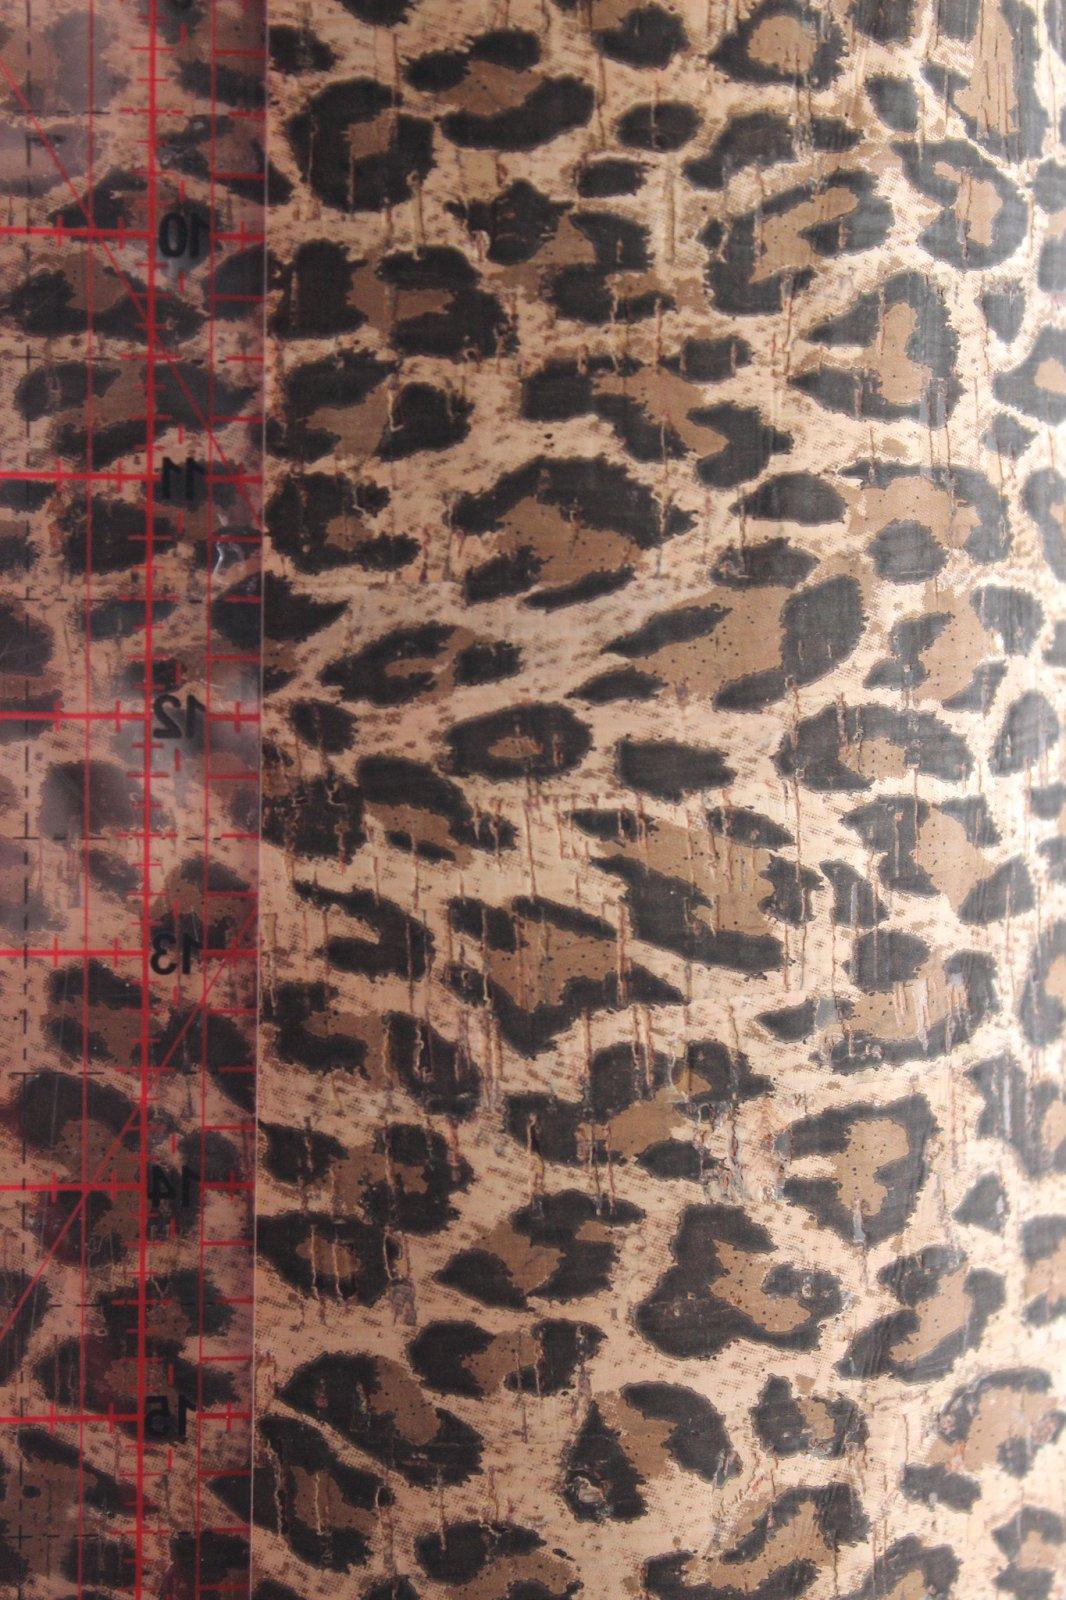 Printed Leopard Cork Fabric (18x36)